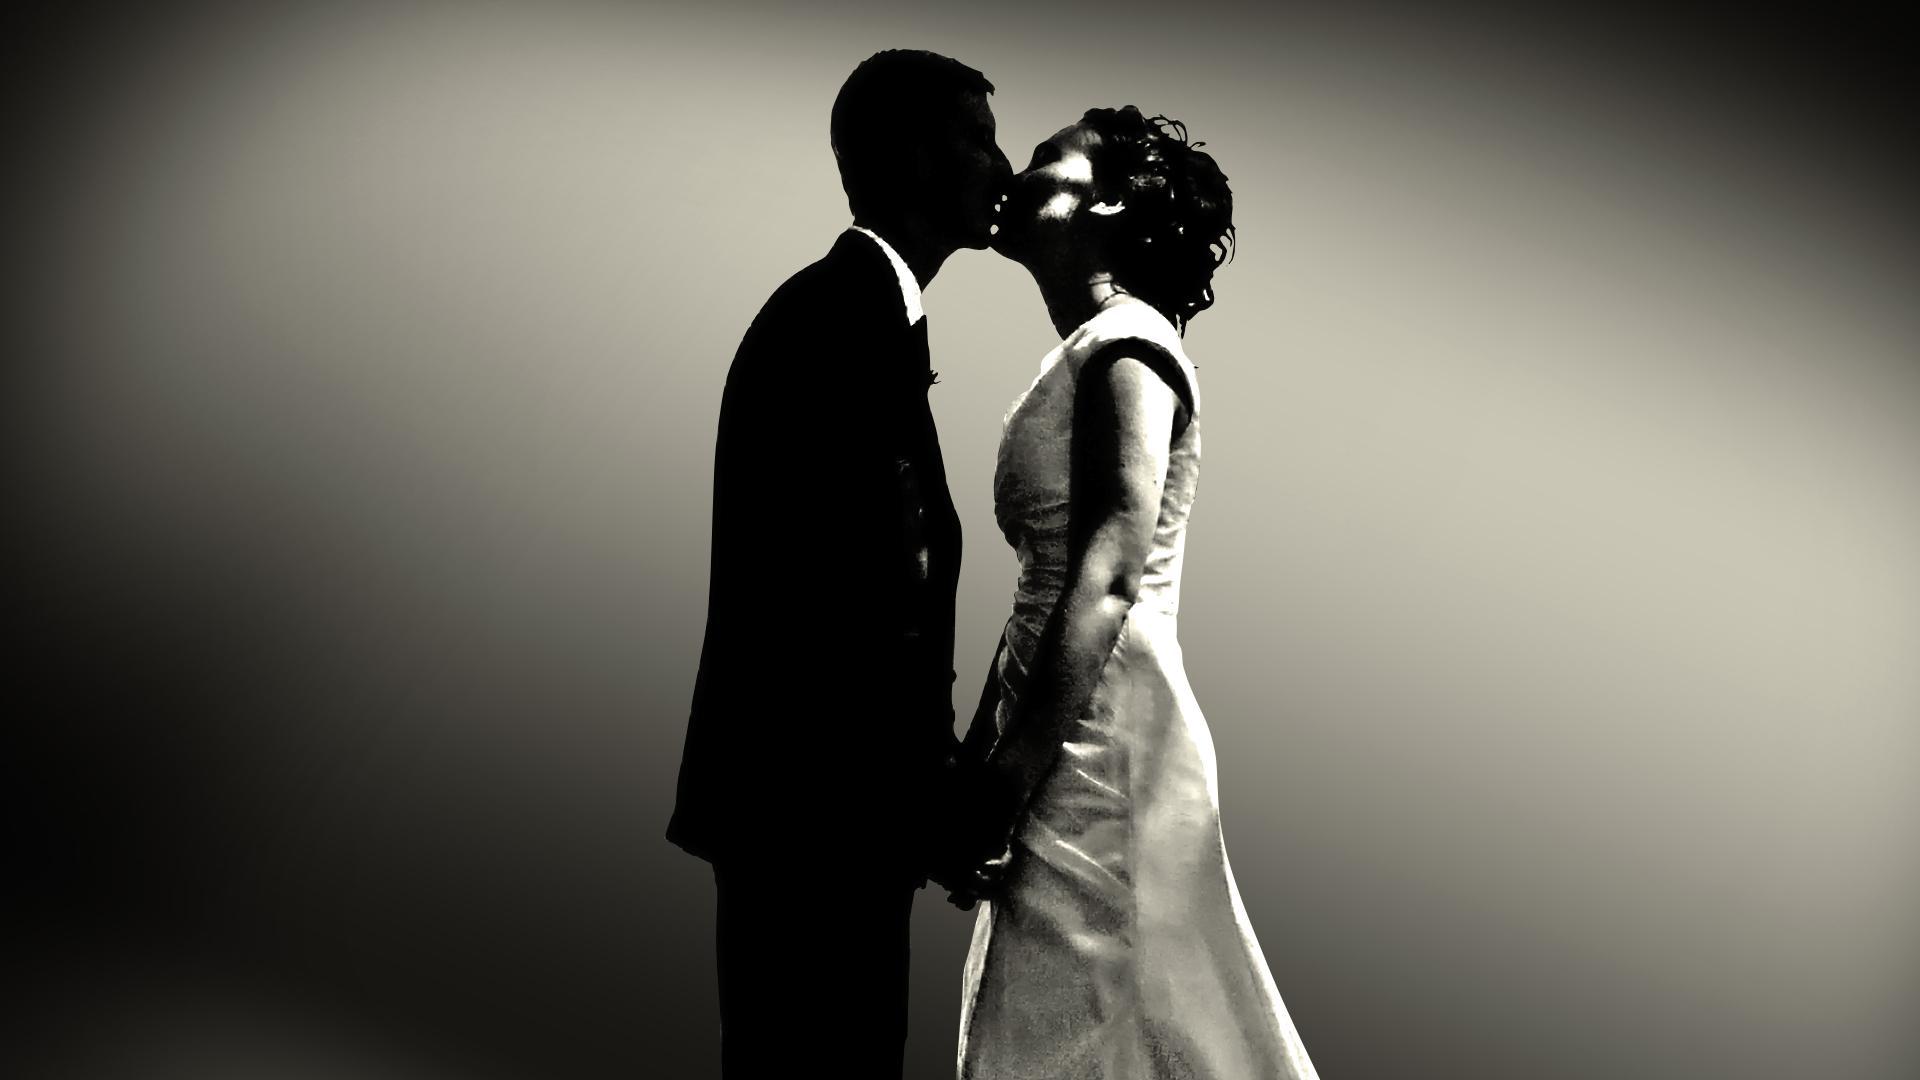 ap_10052601565 - weddings marriage husband and wife_279749